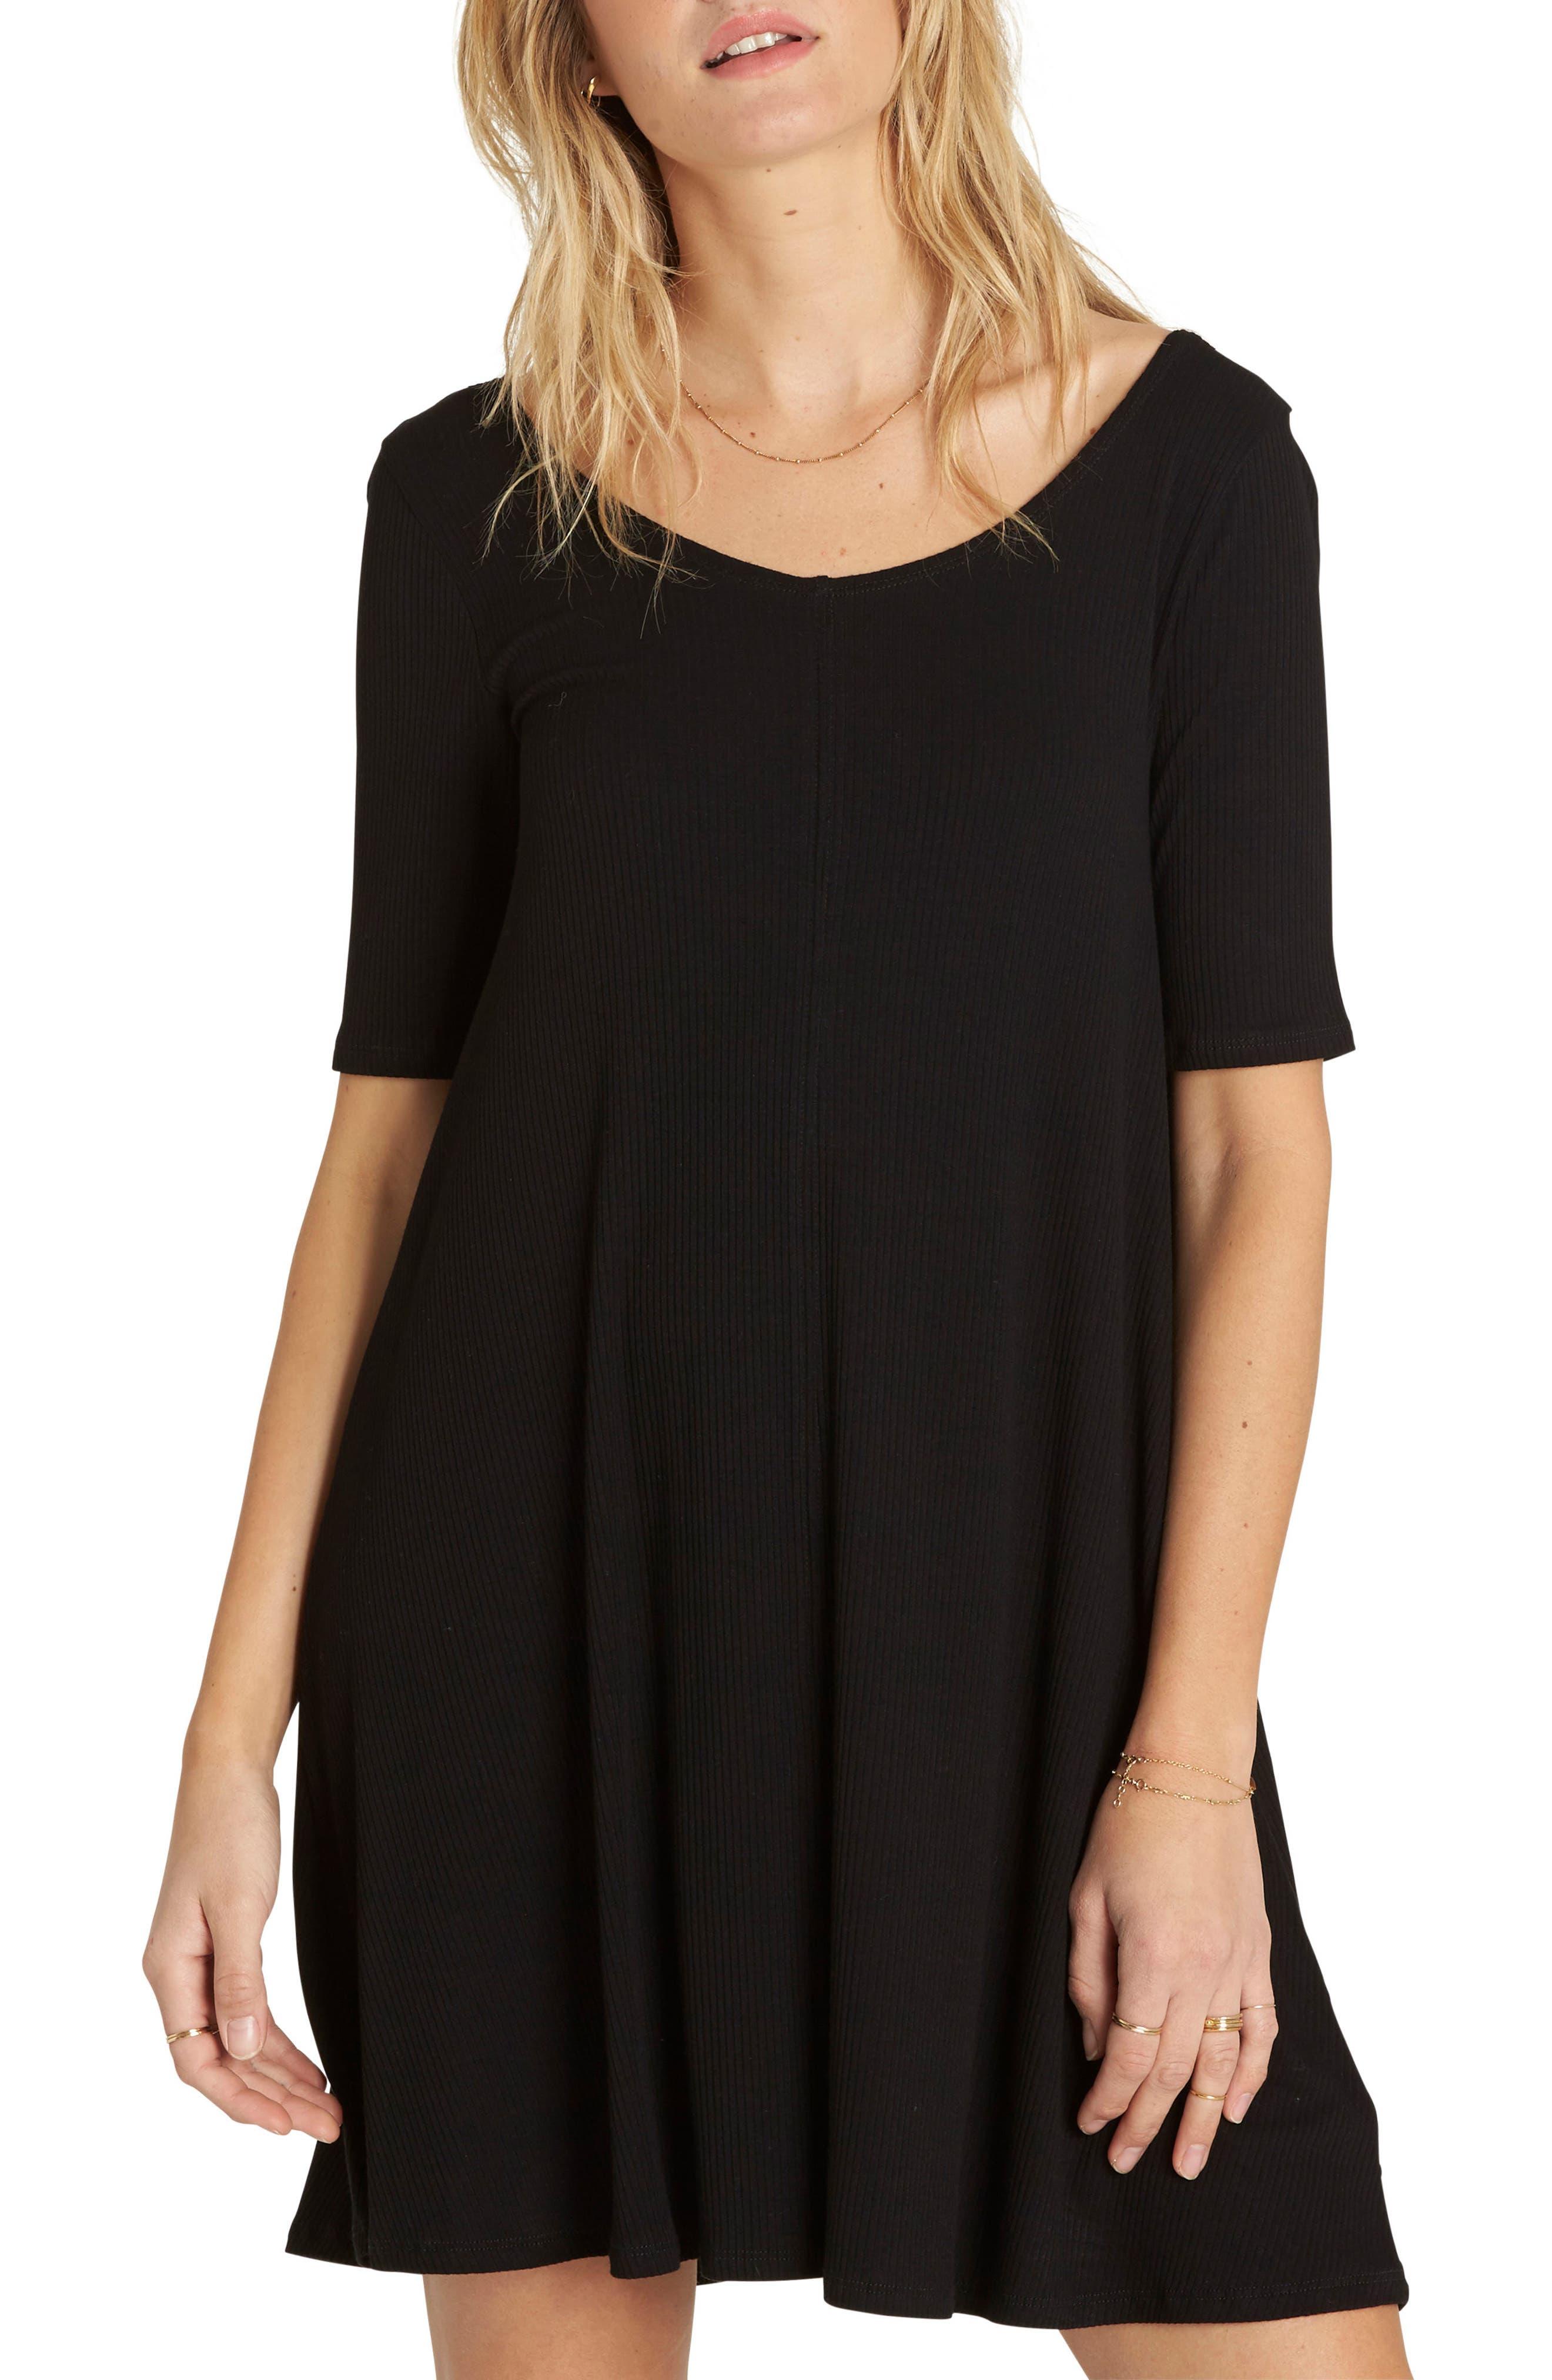 Nothing to Hide Ribbed T-Shirt Dress,                             Main thumbnail 1, color,                             001